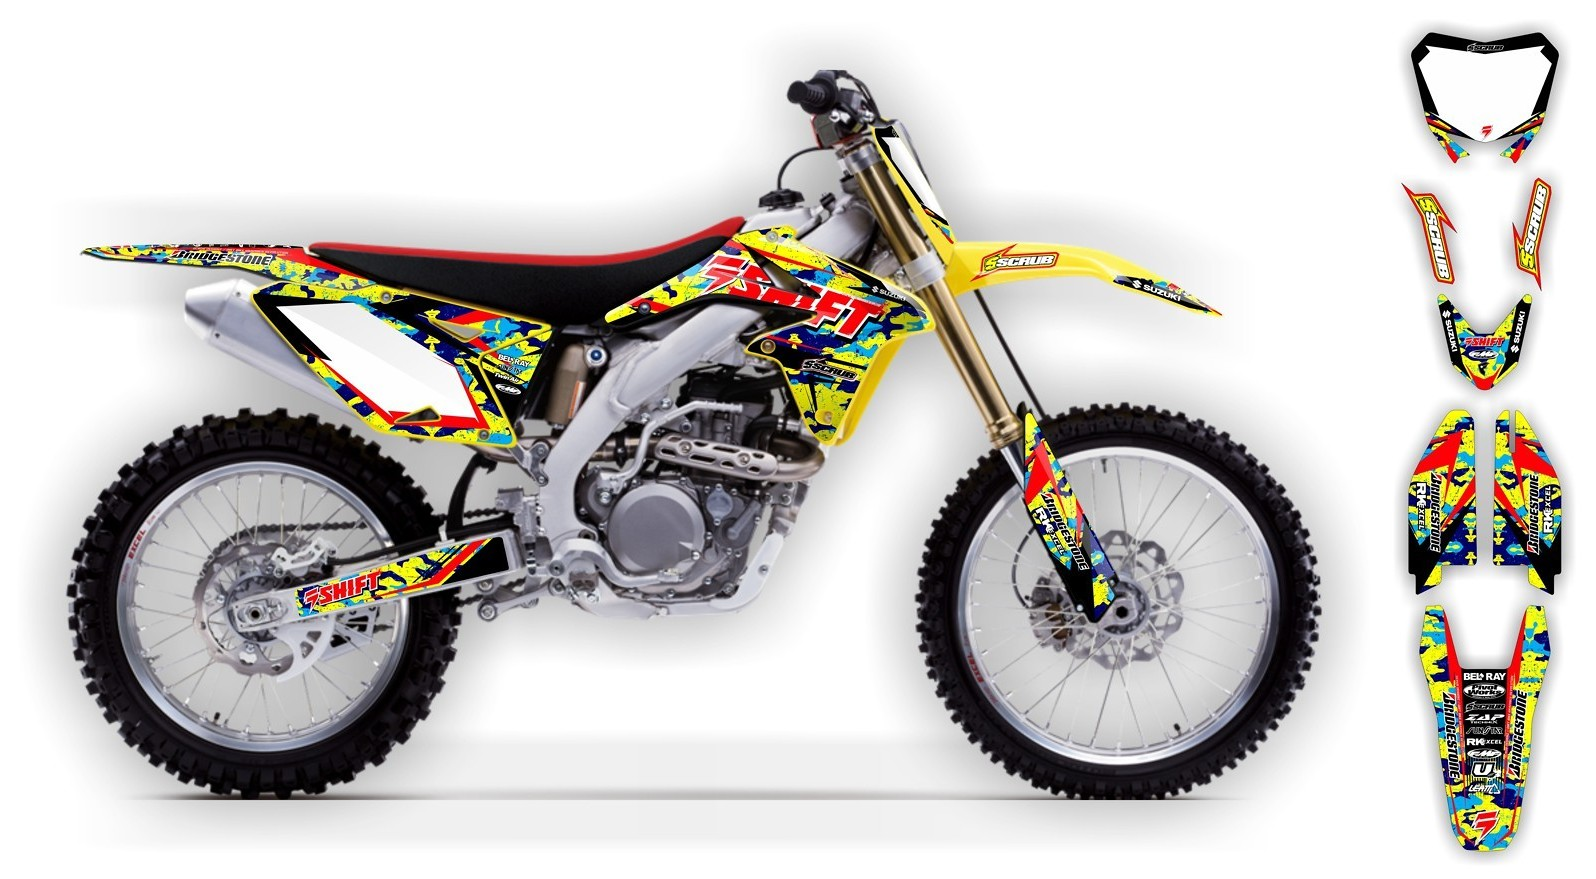 Scrub Designz Suzuki graphics kit Step up  SUZUKI graphics